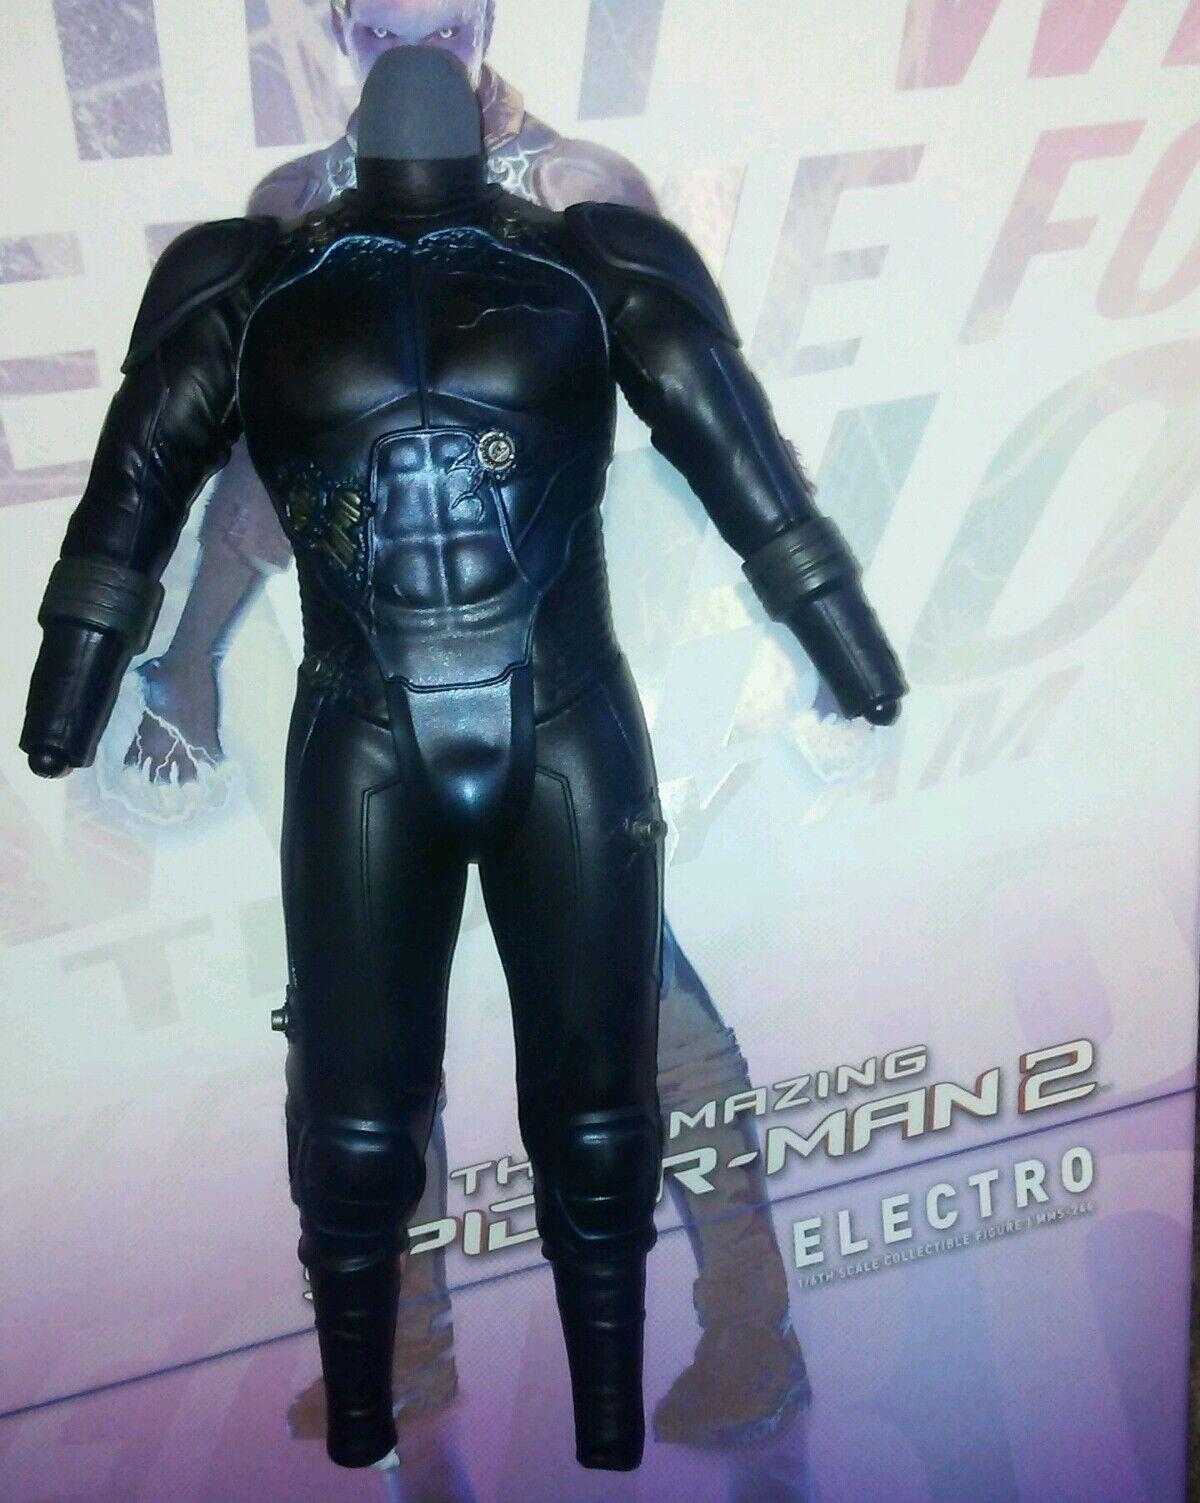 1 6 Hot Juguetes Electro Cuerpo con traje azul negro Con Luz Led MMS246 US Seller